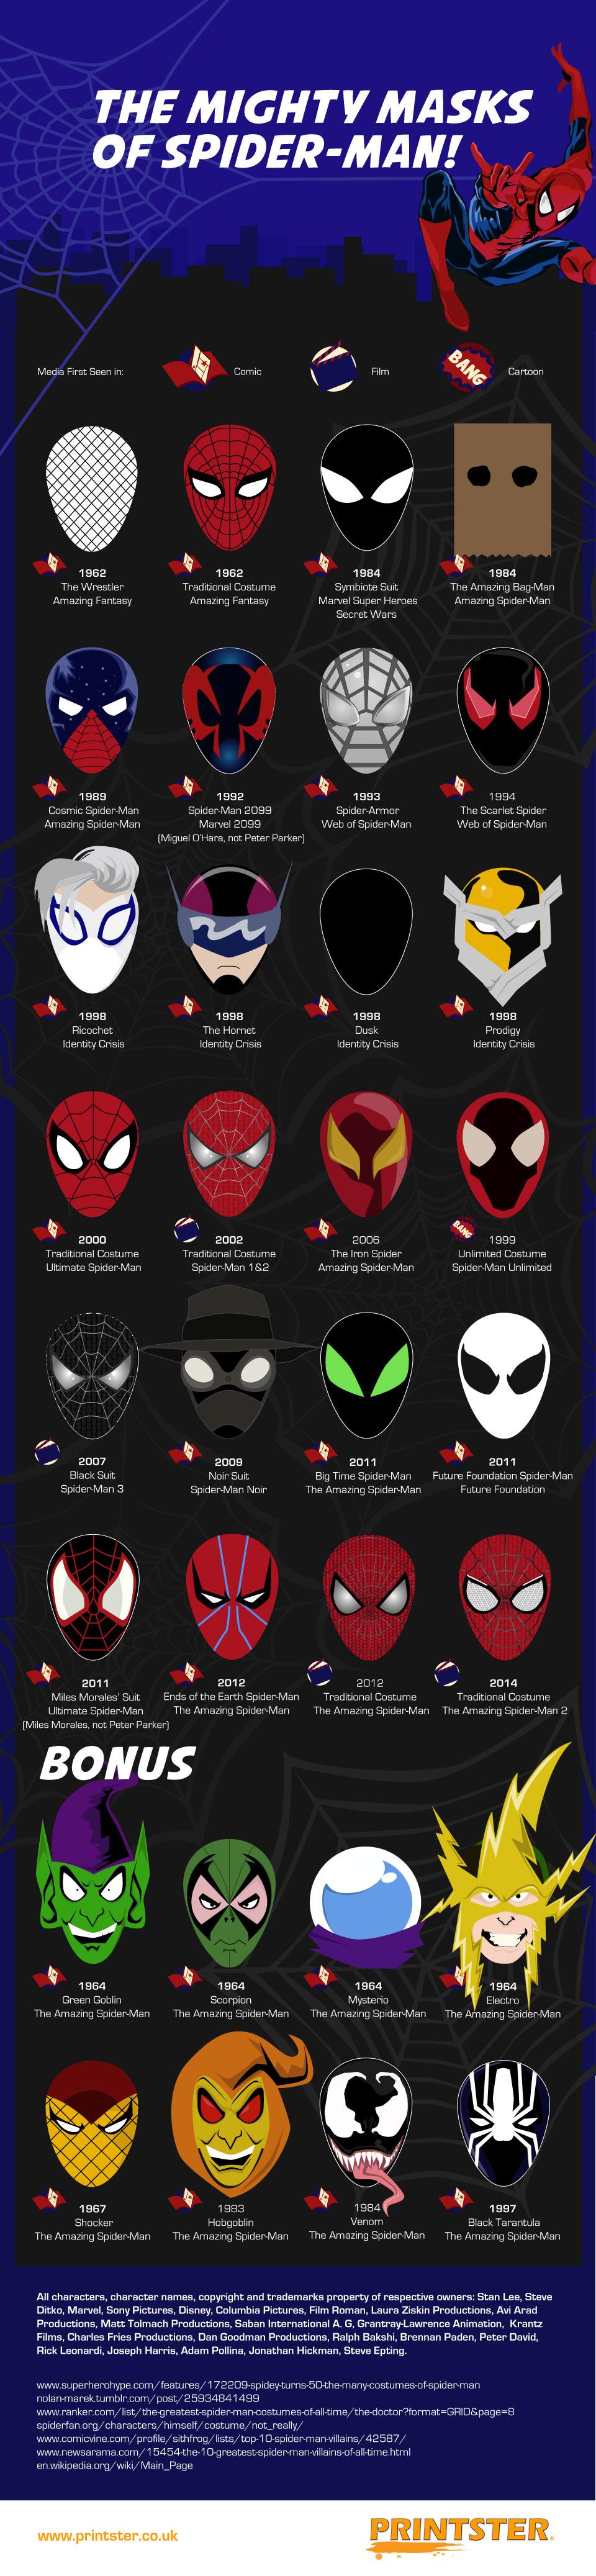 Masks_Infographic_Final